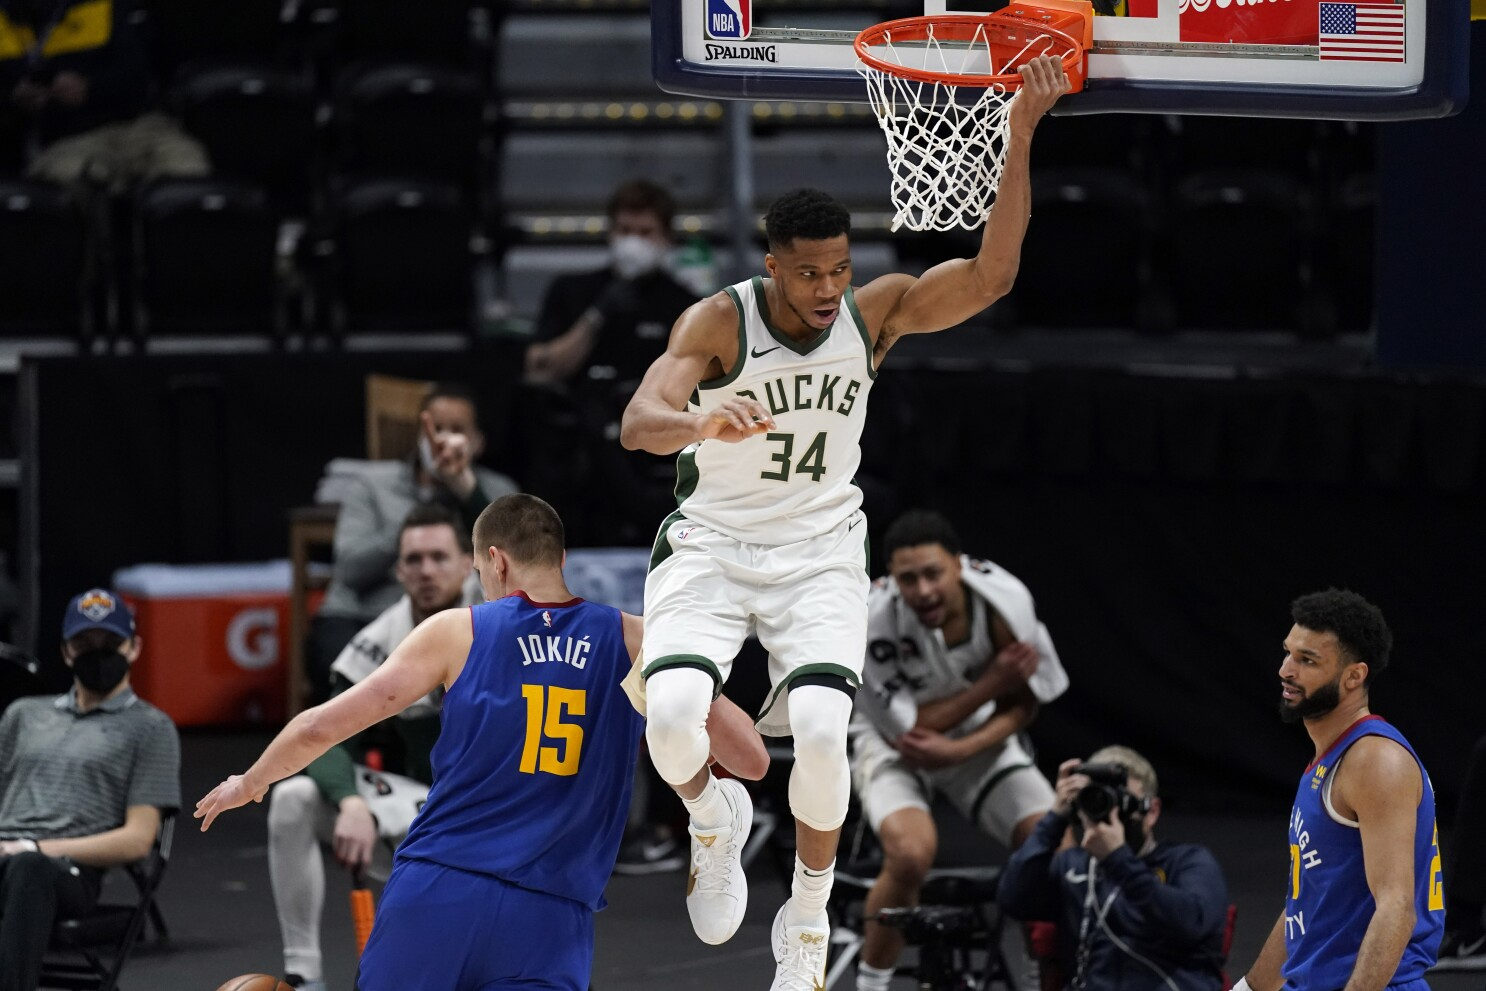 NBA: Bucks beat Nuggets in Giannis-Jokic showdown - Los Angeles Times